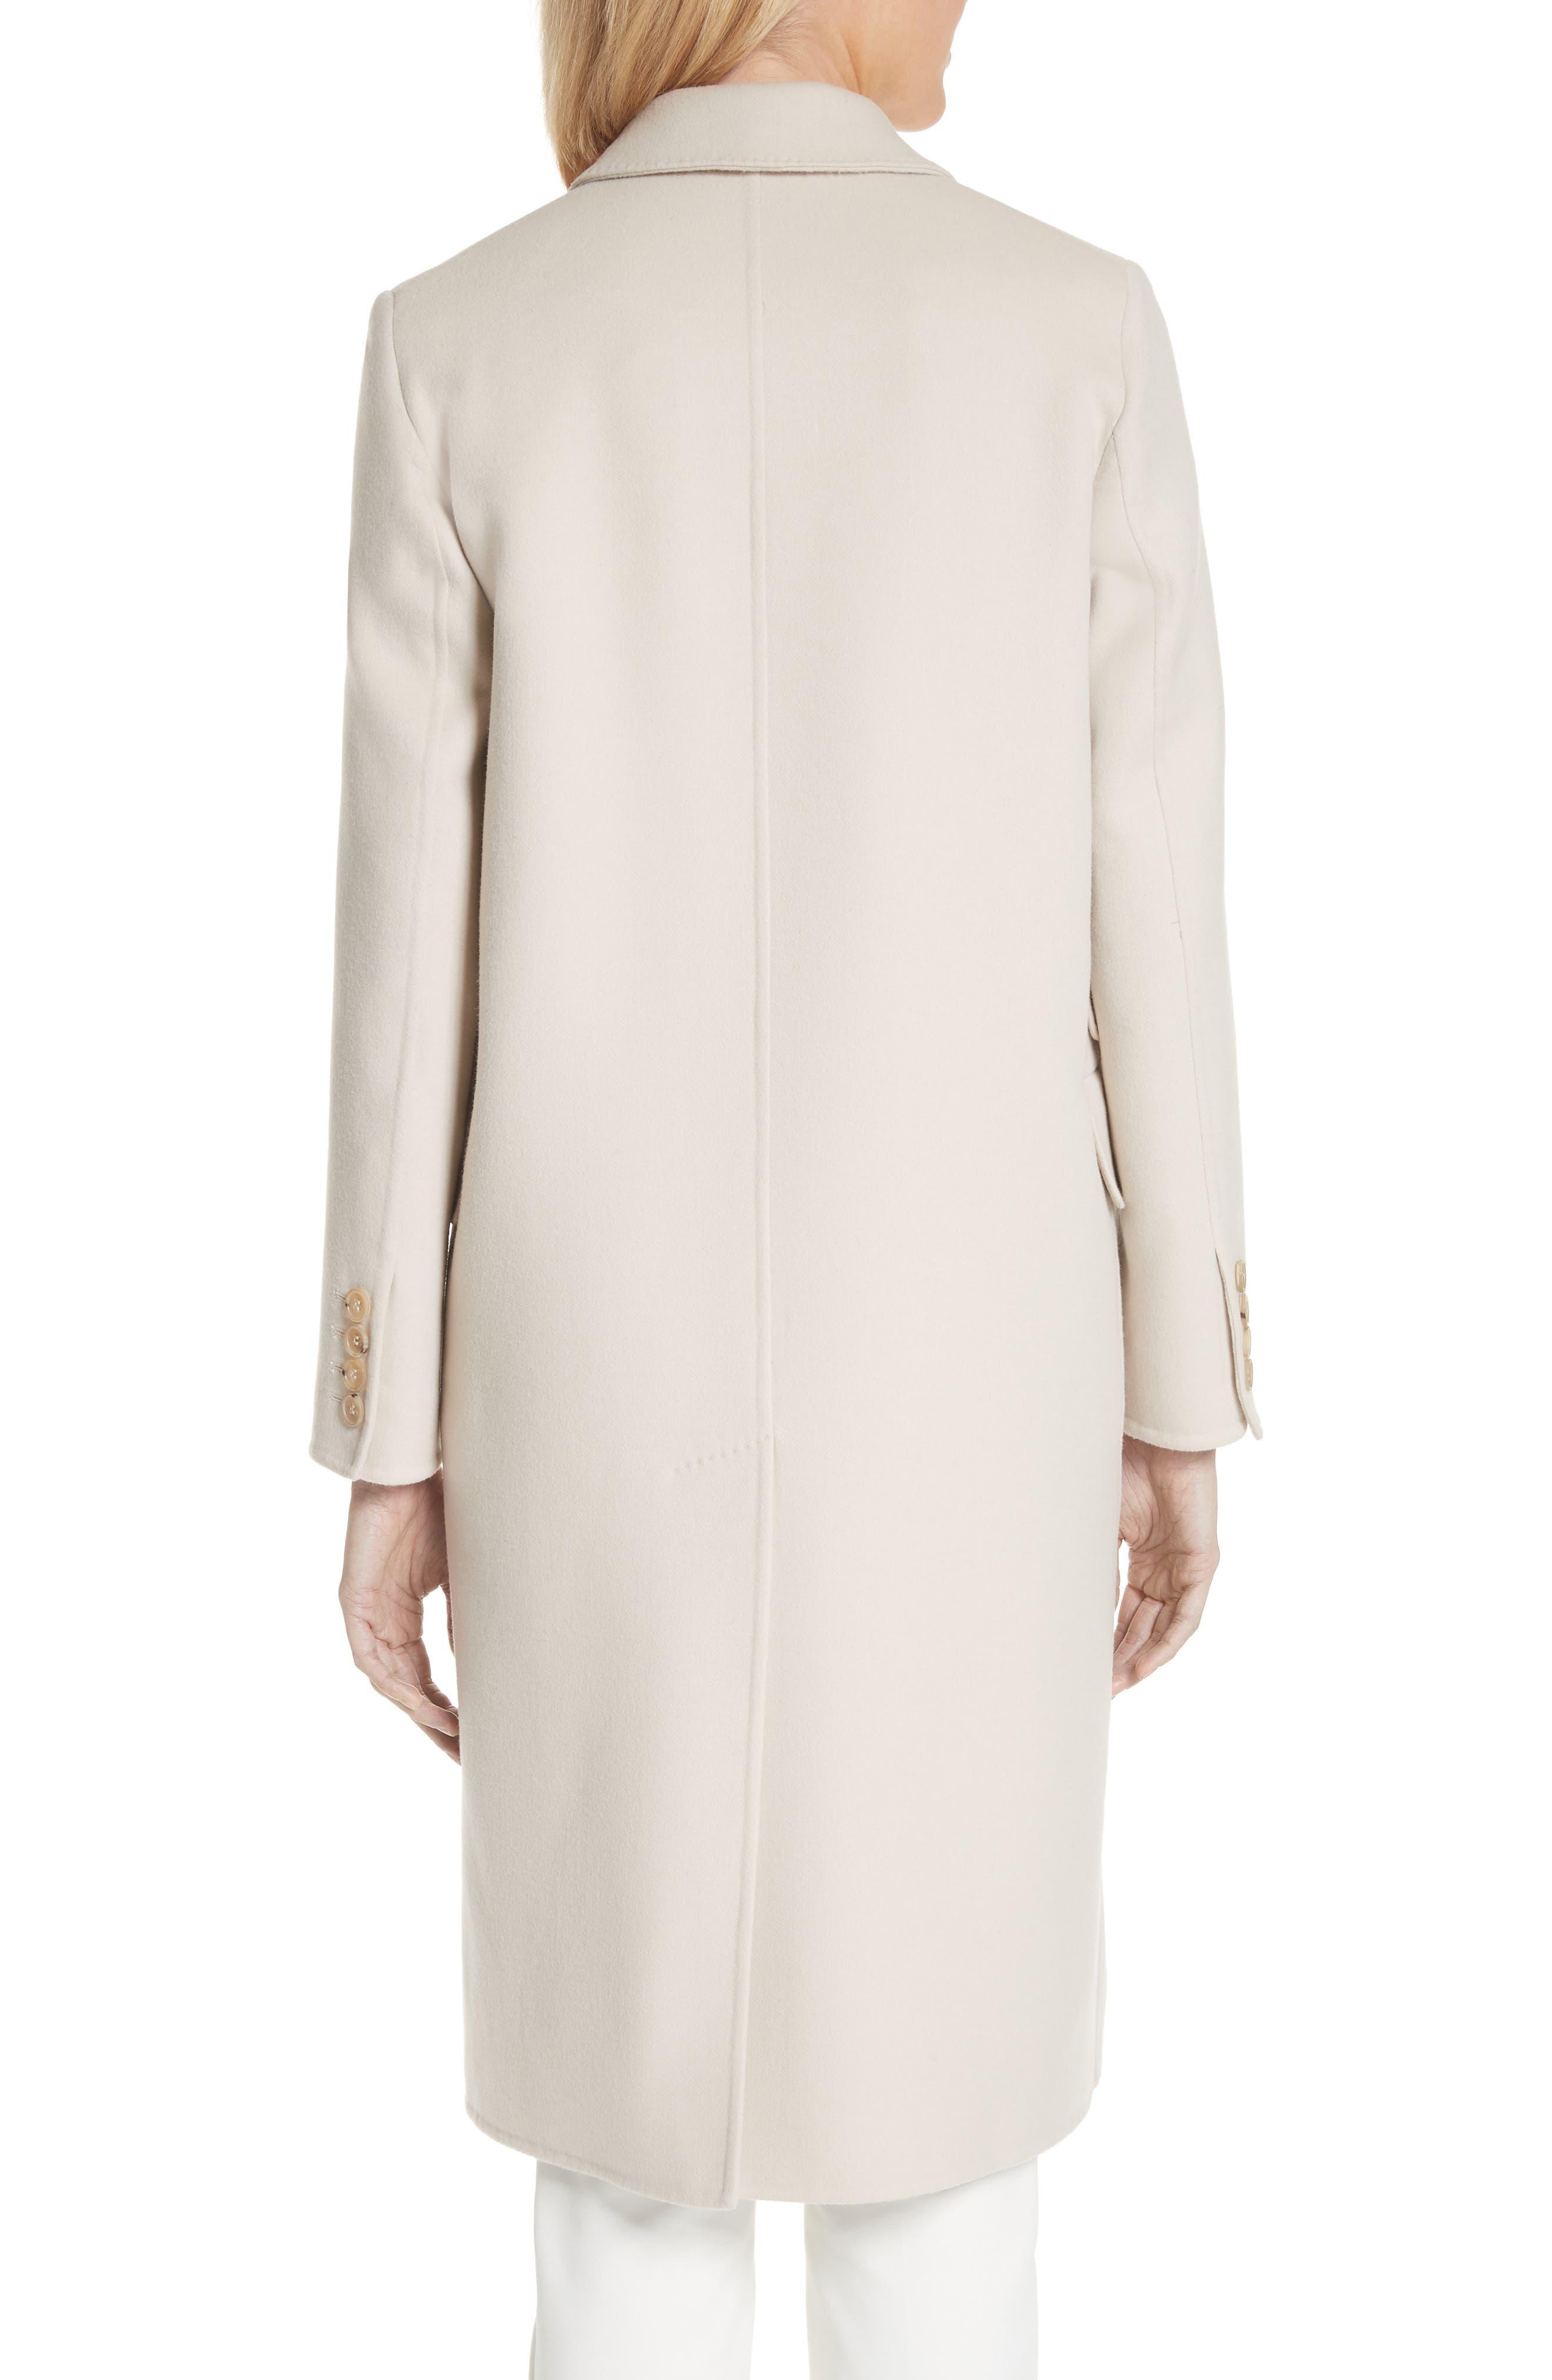 Armonia Wool & Cashmere Coat,                             Alternate thumbnail 2, color,                             906